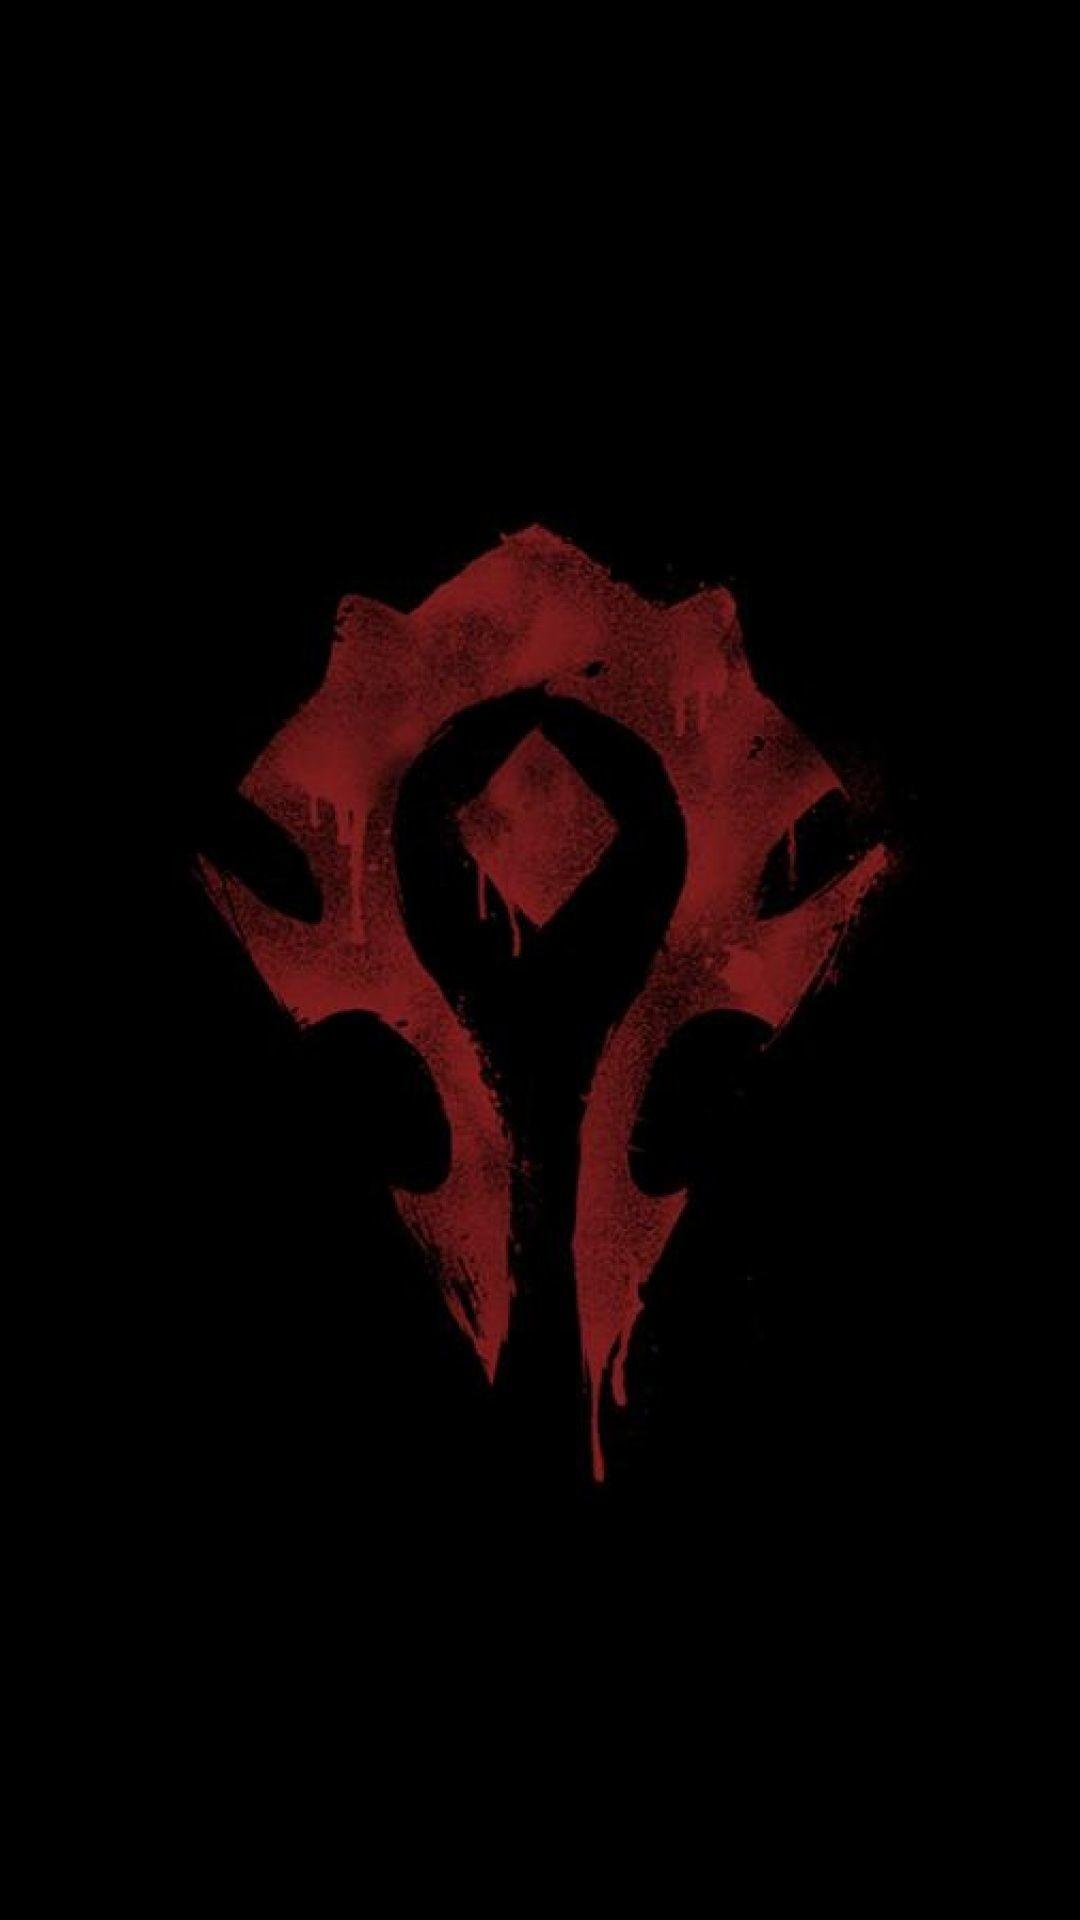 Download Horde Logo Wallpaper Hd Backgrounds Download Itl Cat